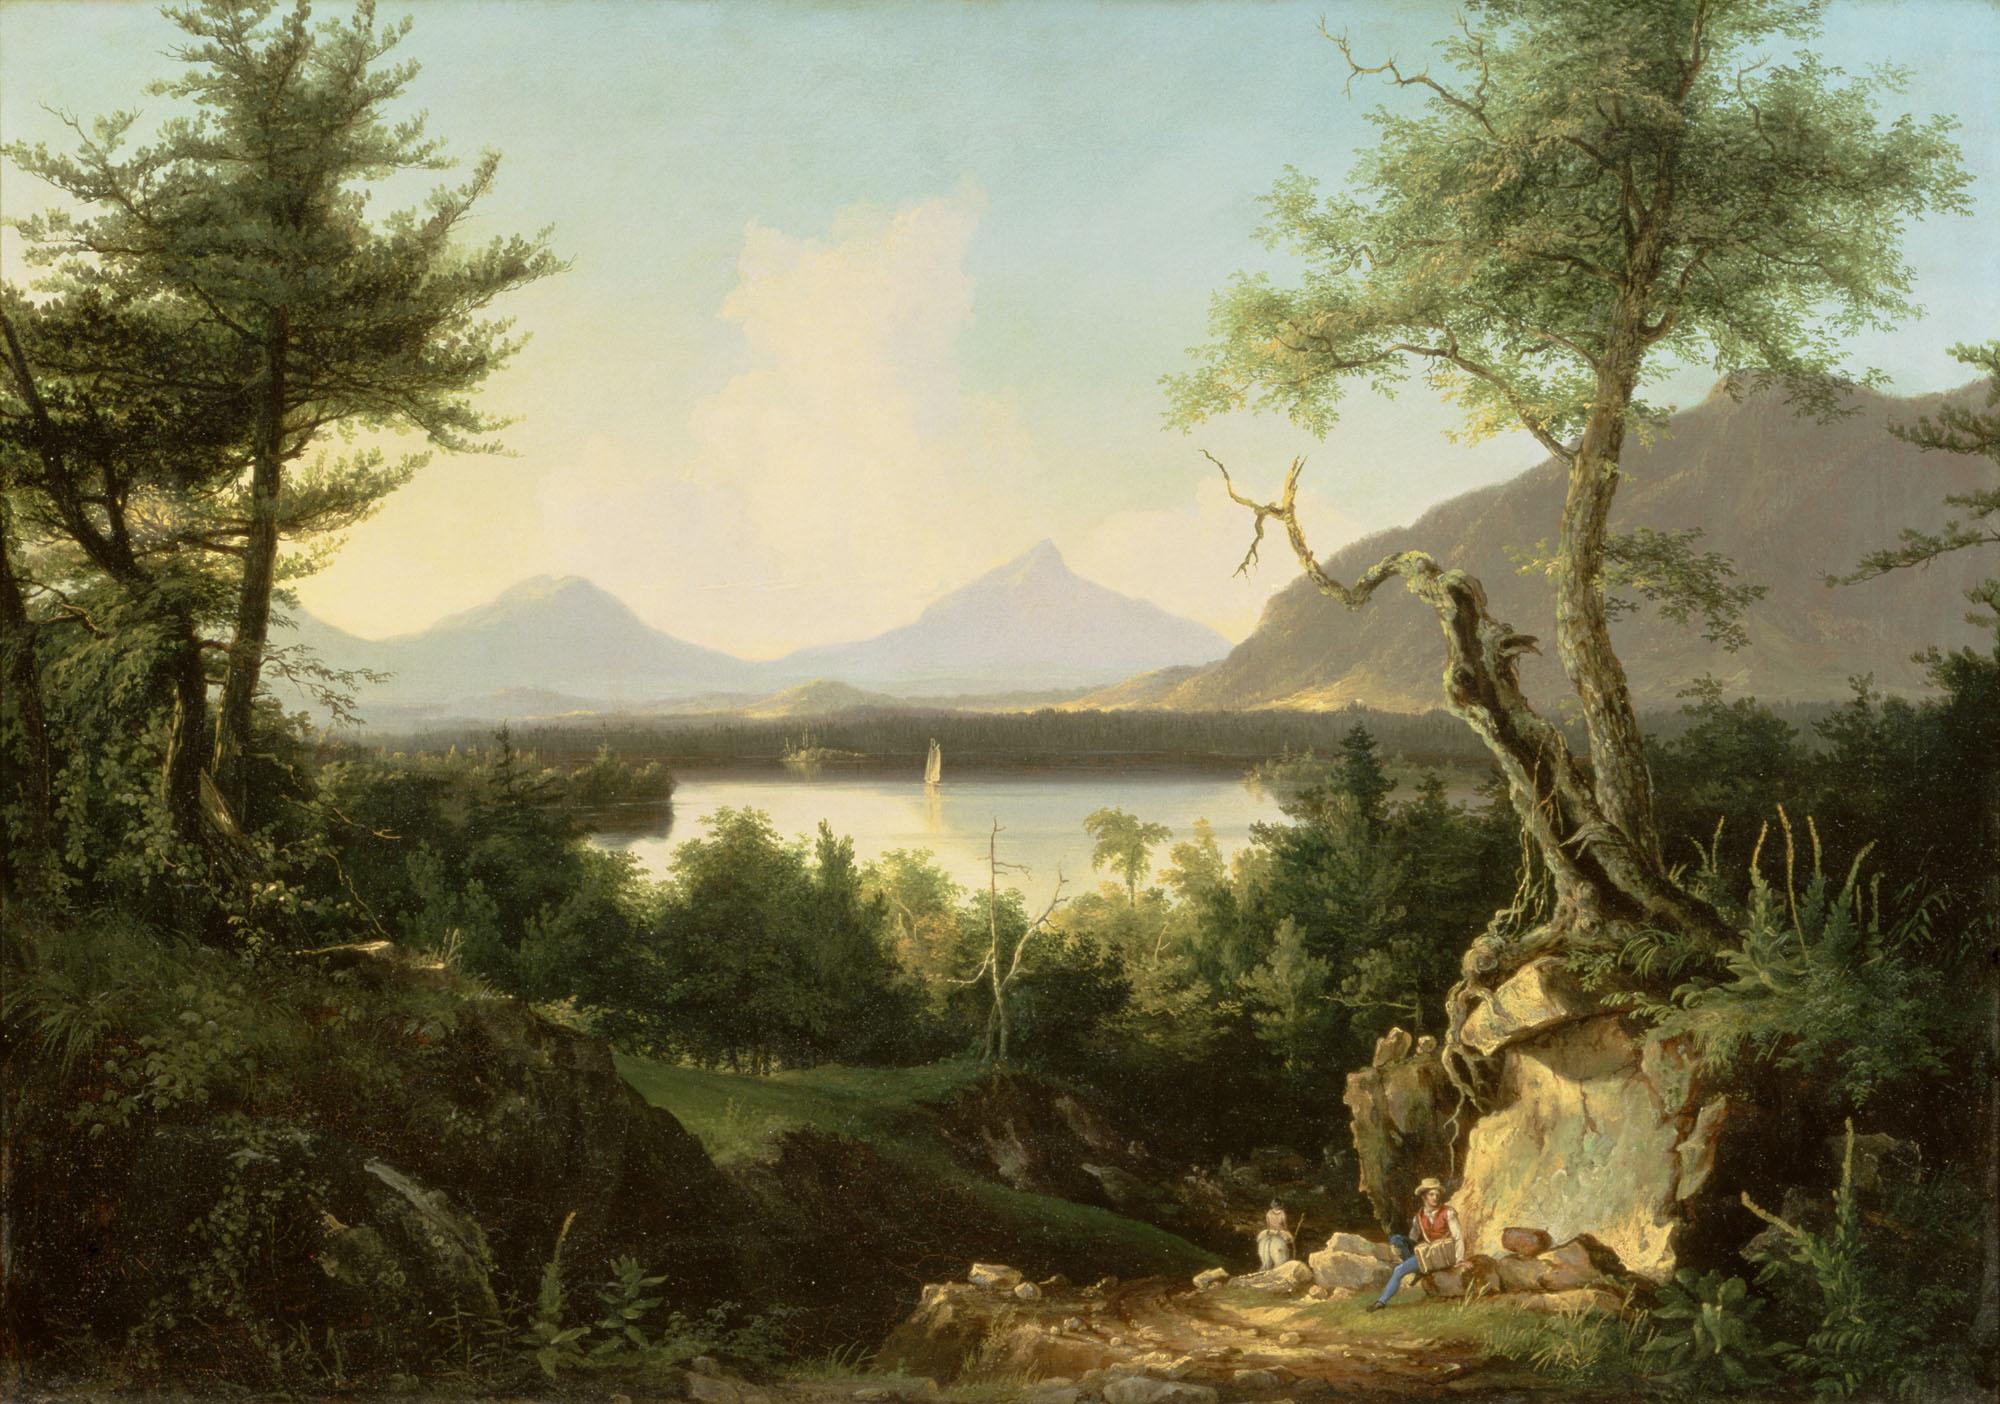 Thomas cole essay on american scenery